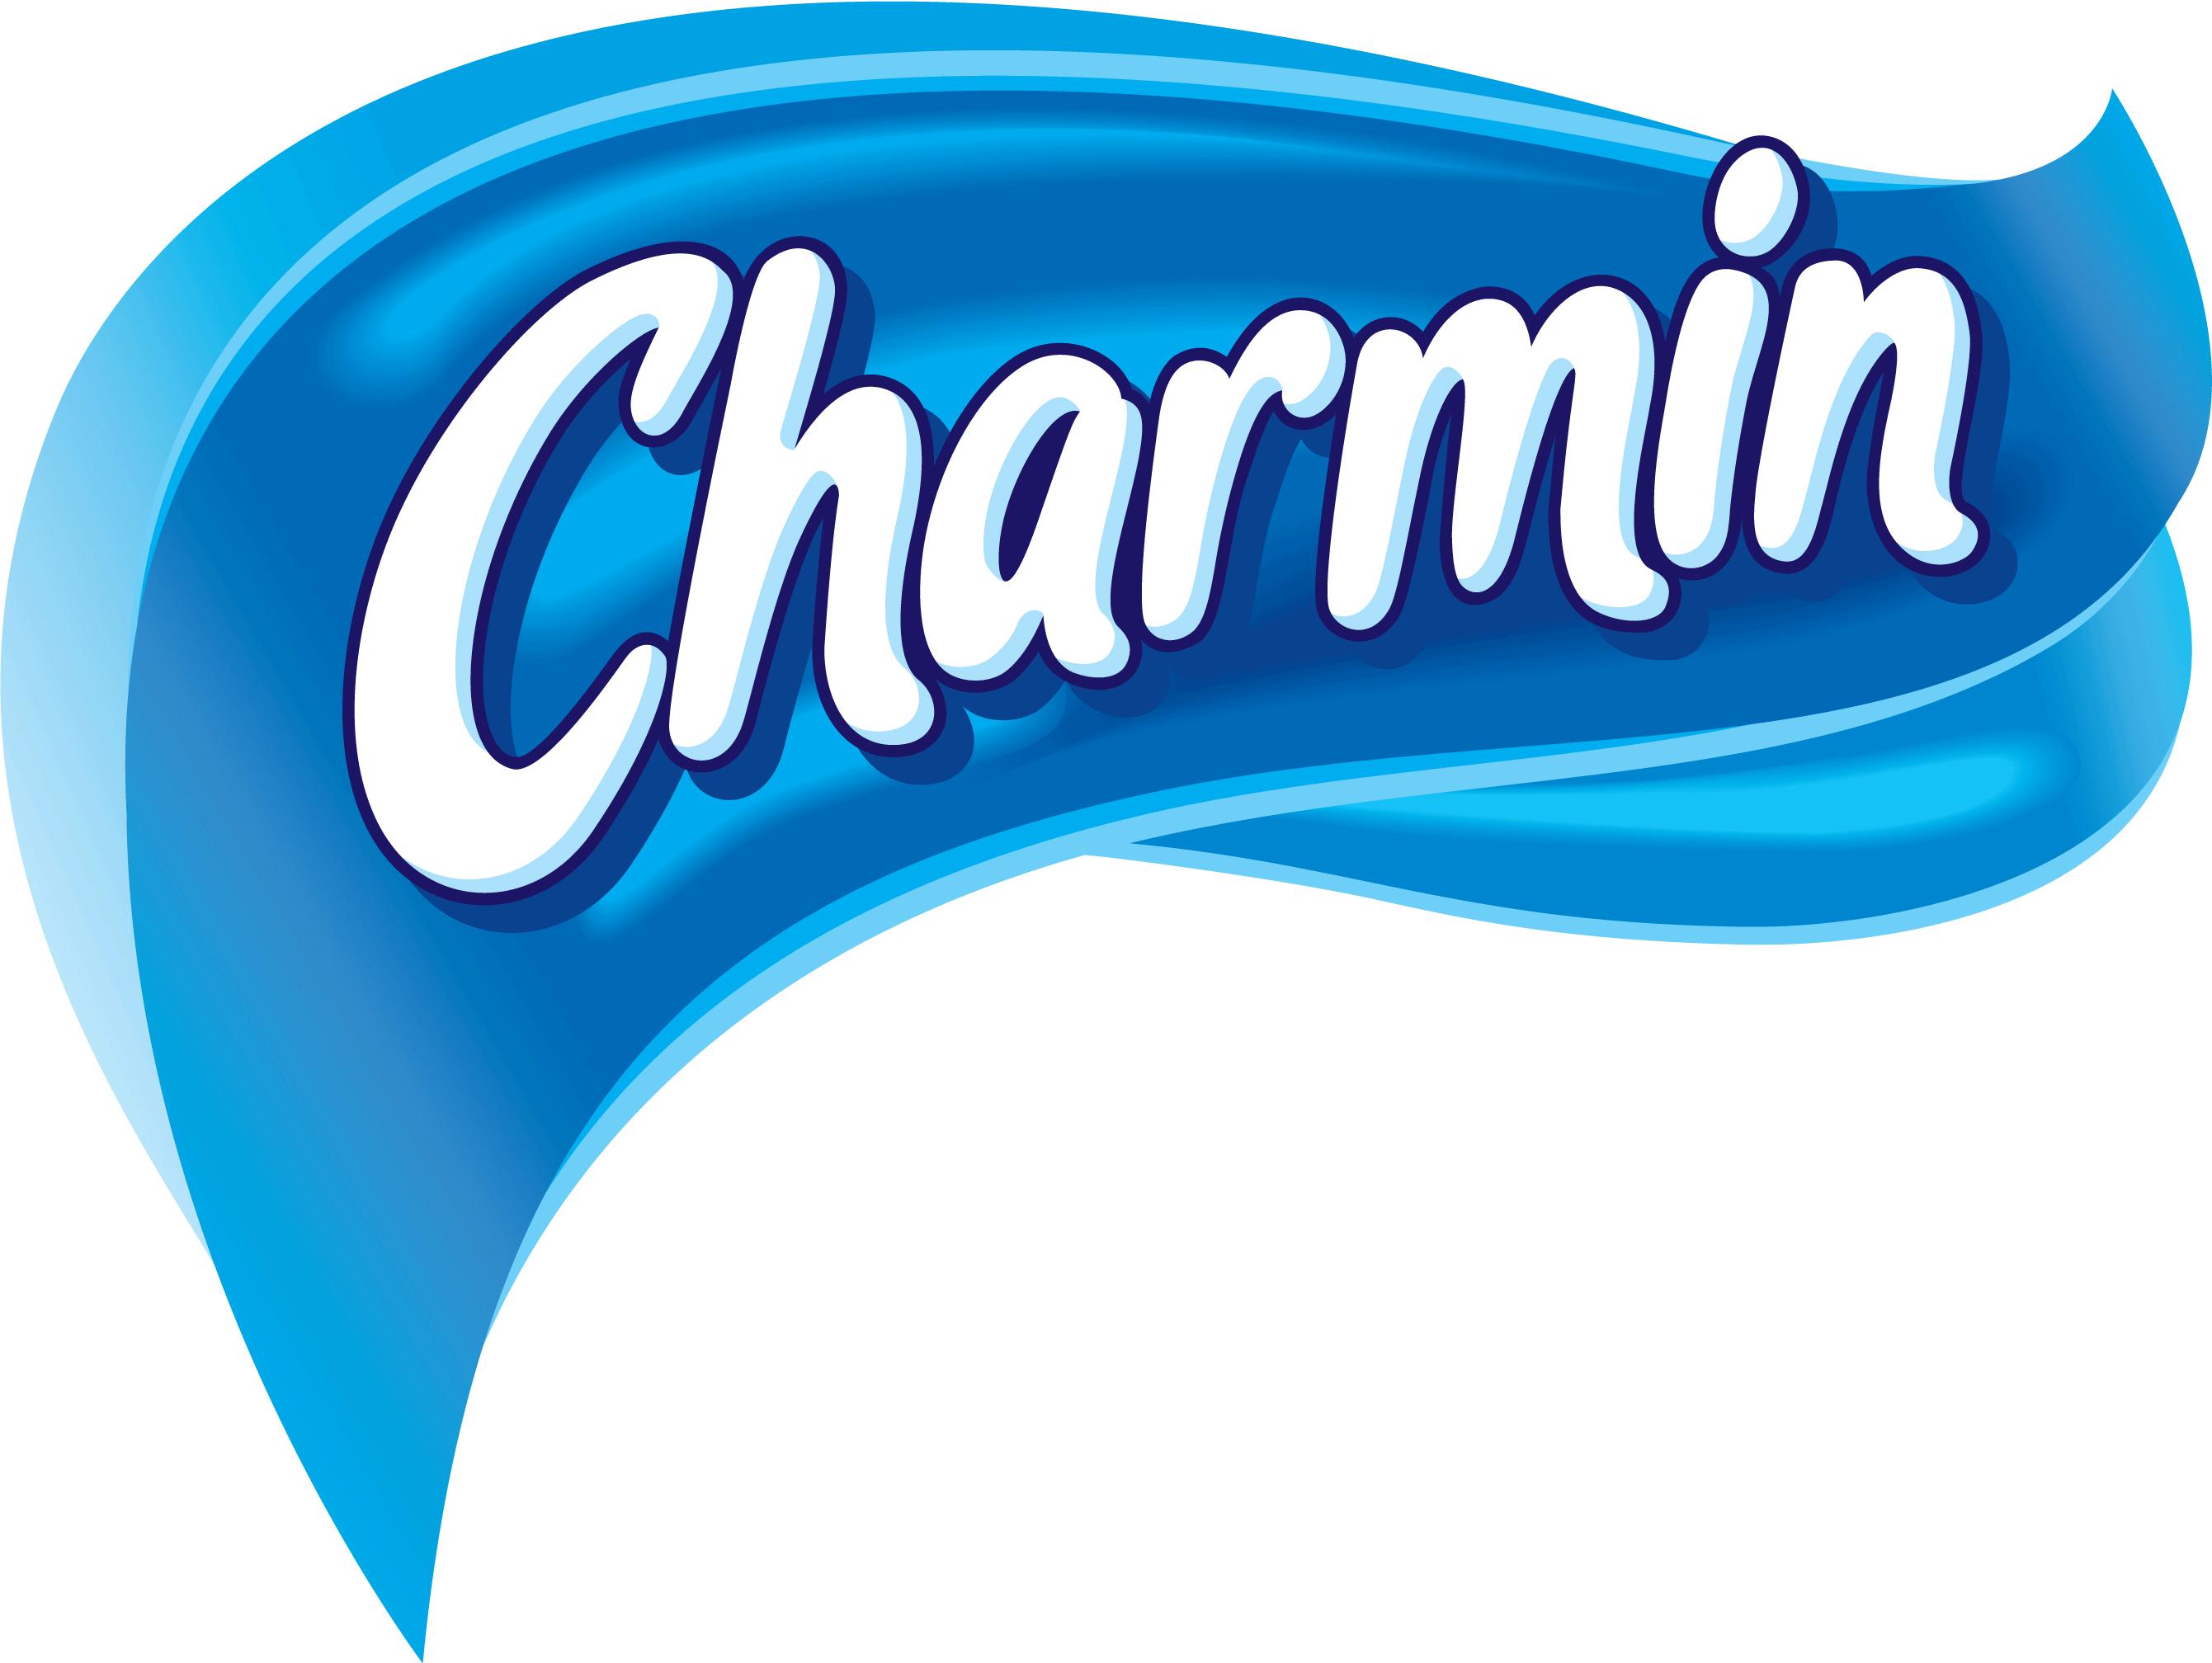 Charmin - Logopedia, the logo and branding site